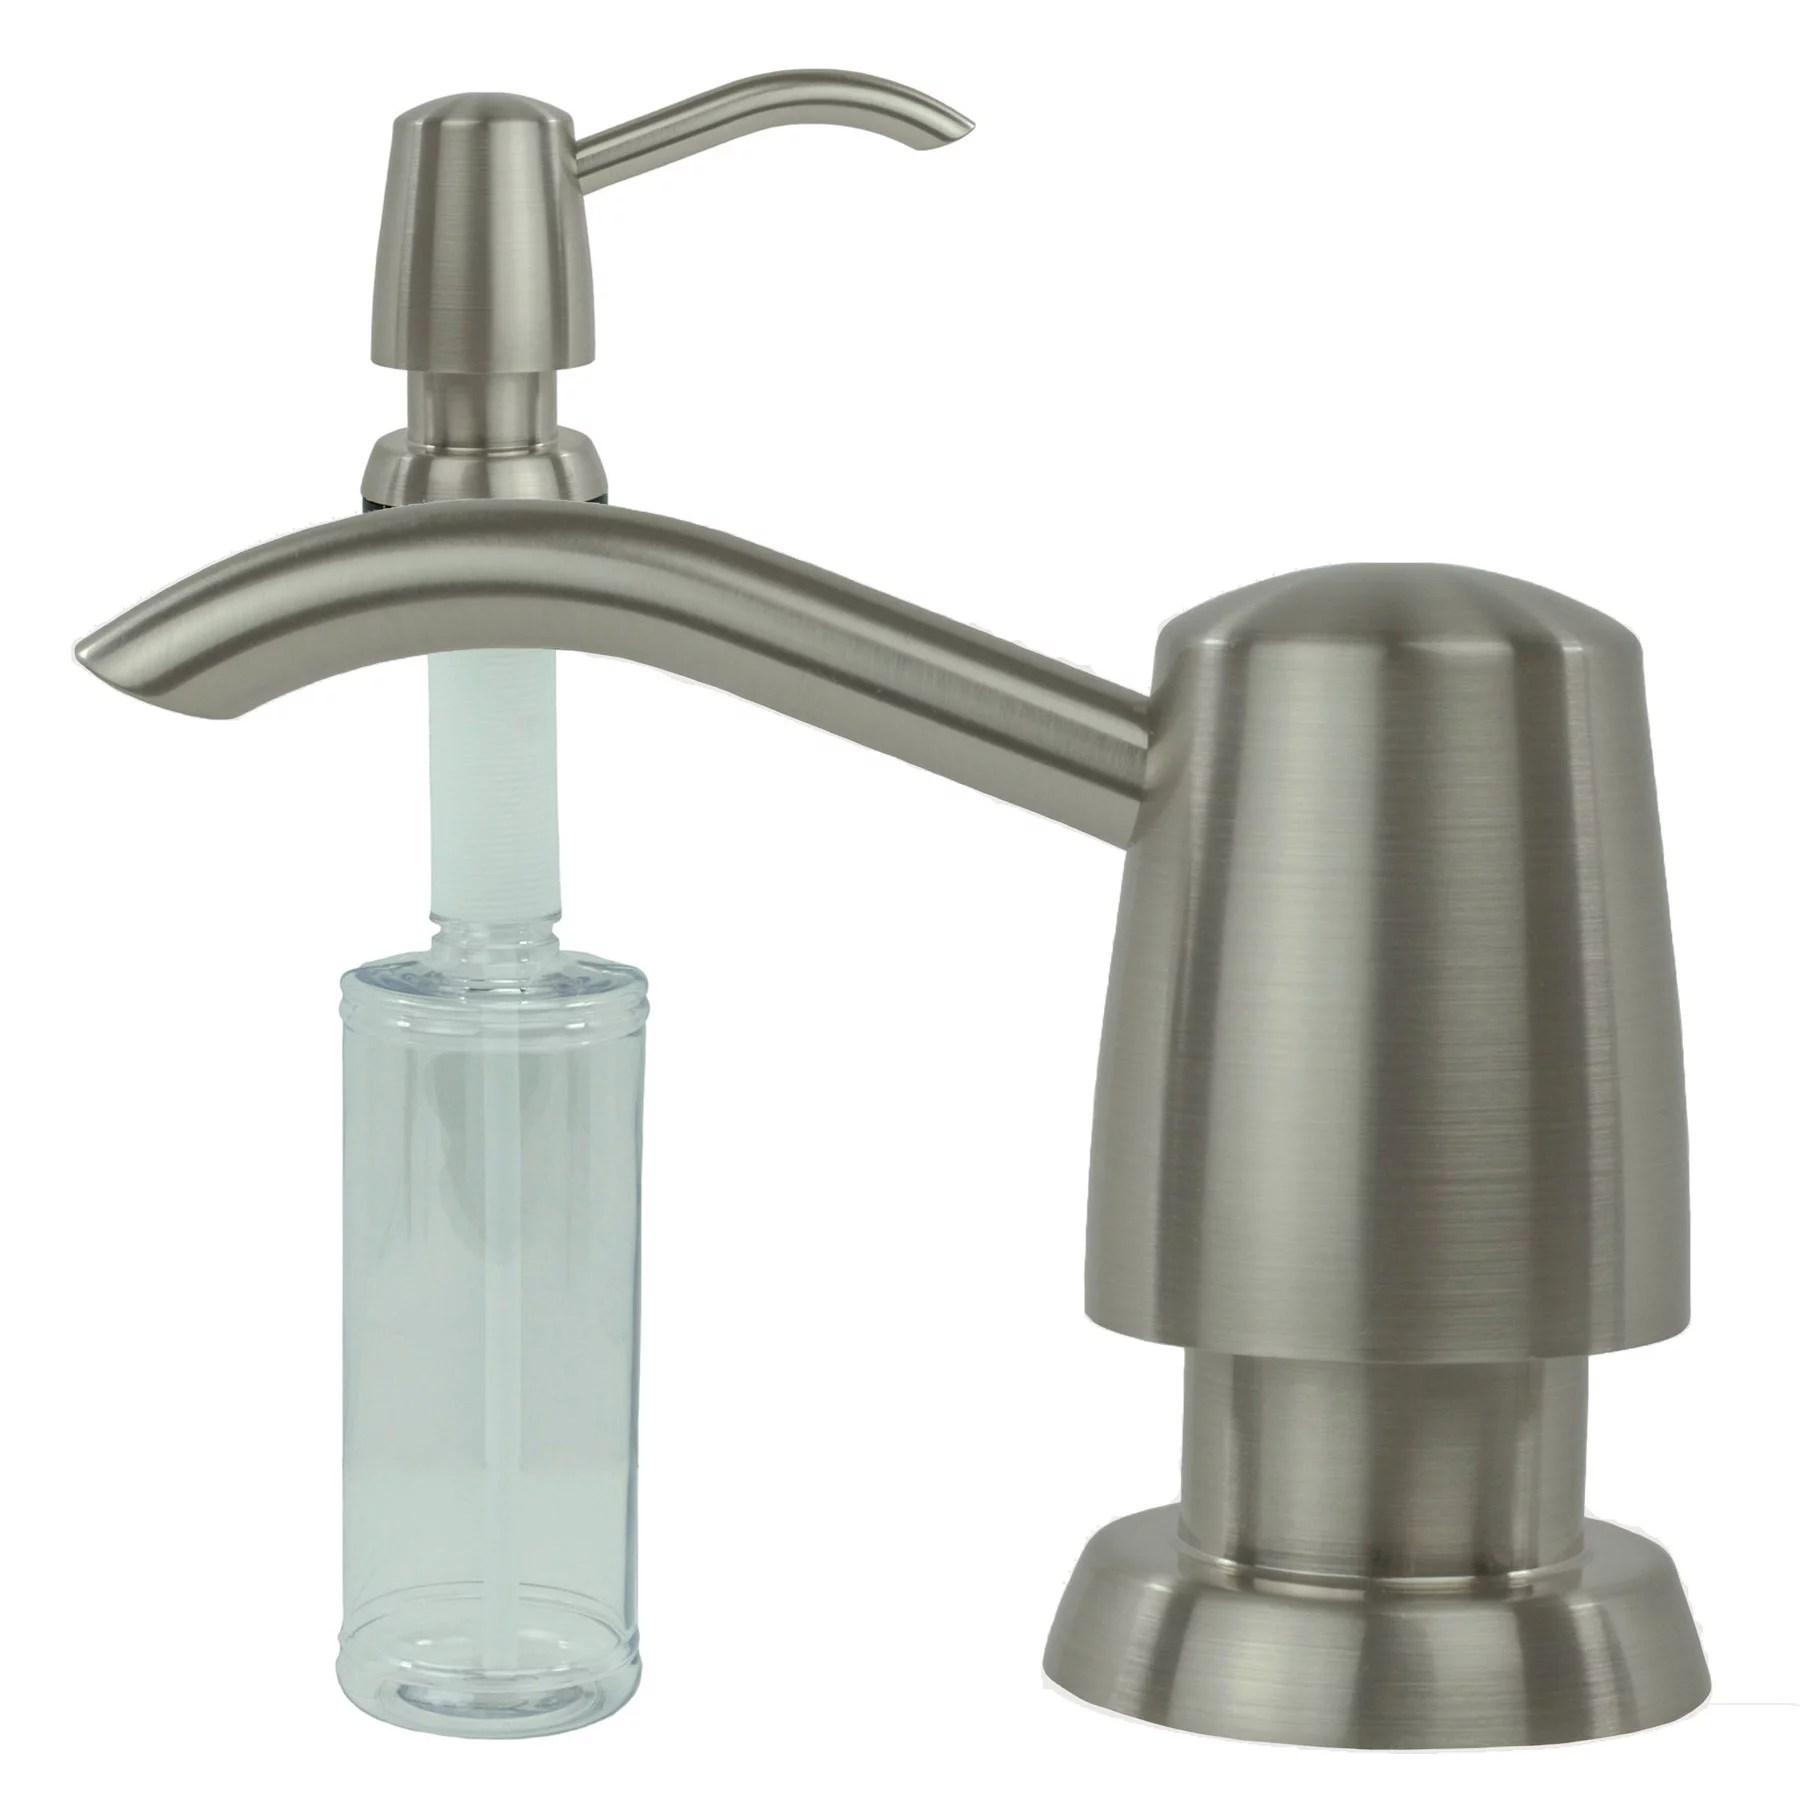 kitchen sink liquid built in soap dispenser lotion pump modern curved arc nozzle stainless walmart com